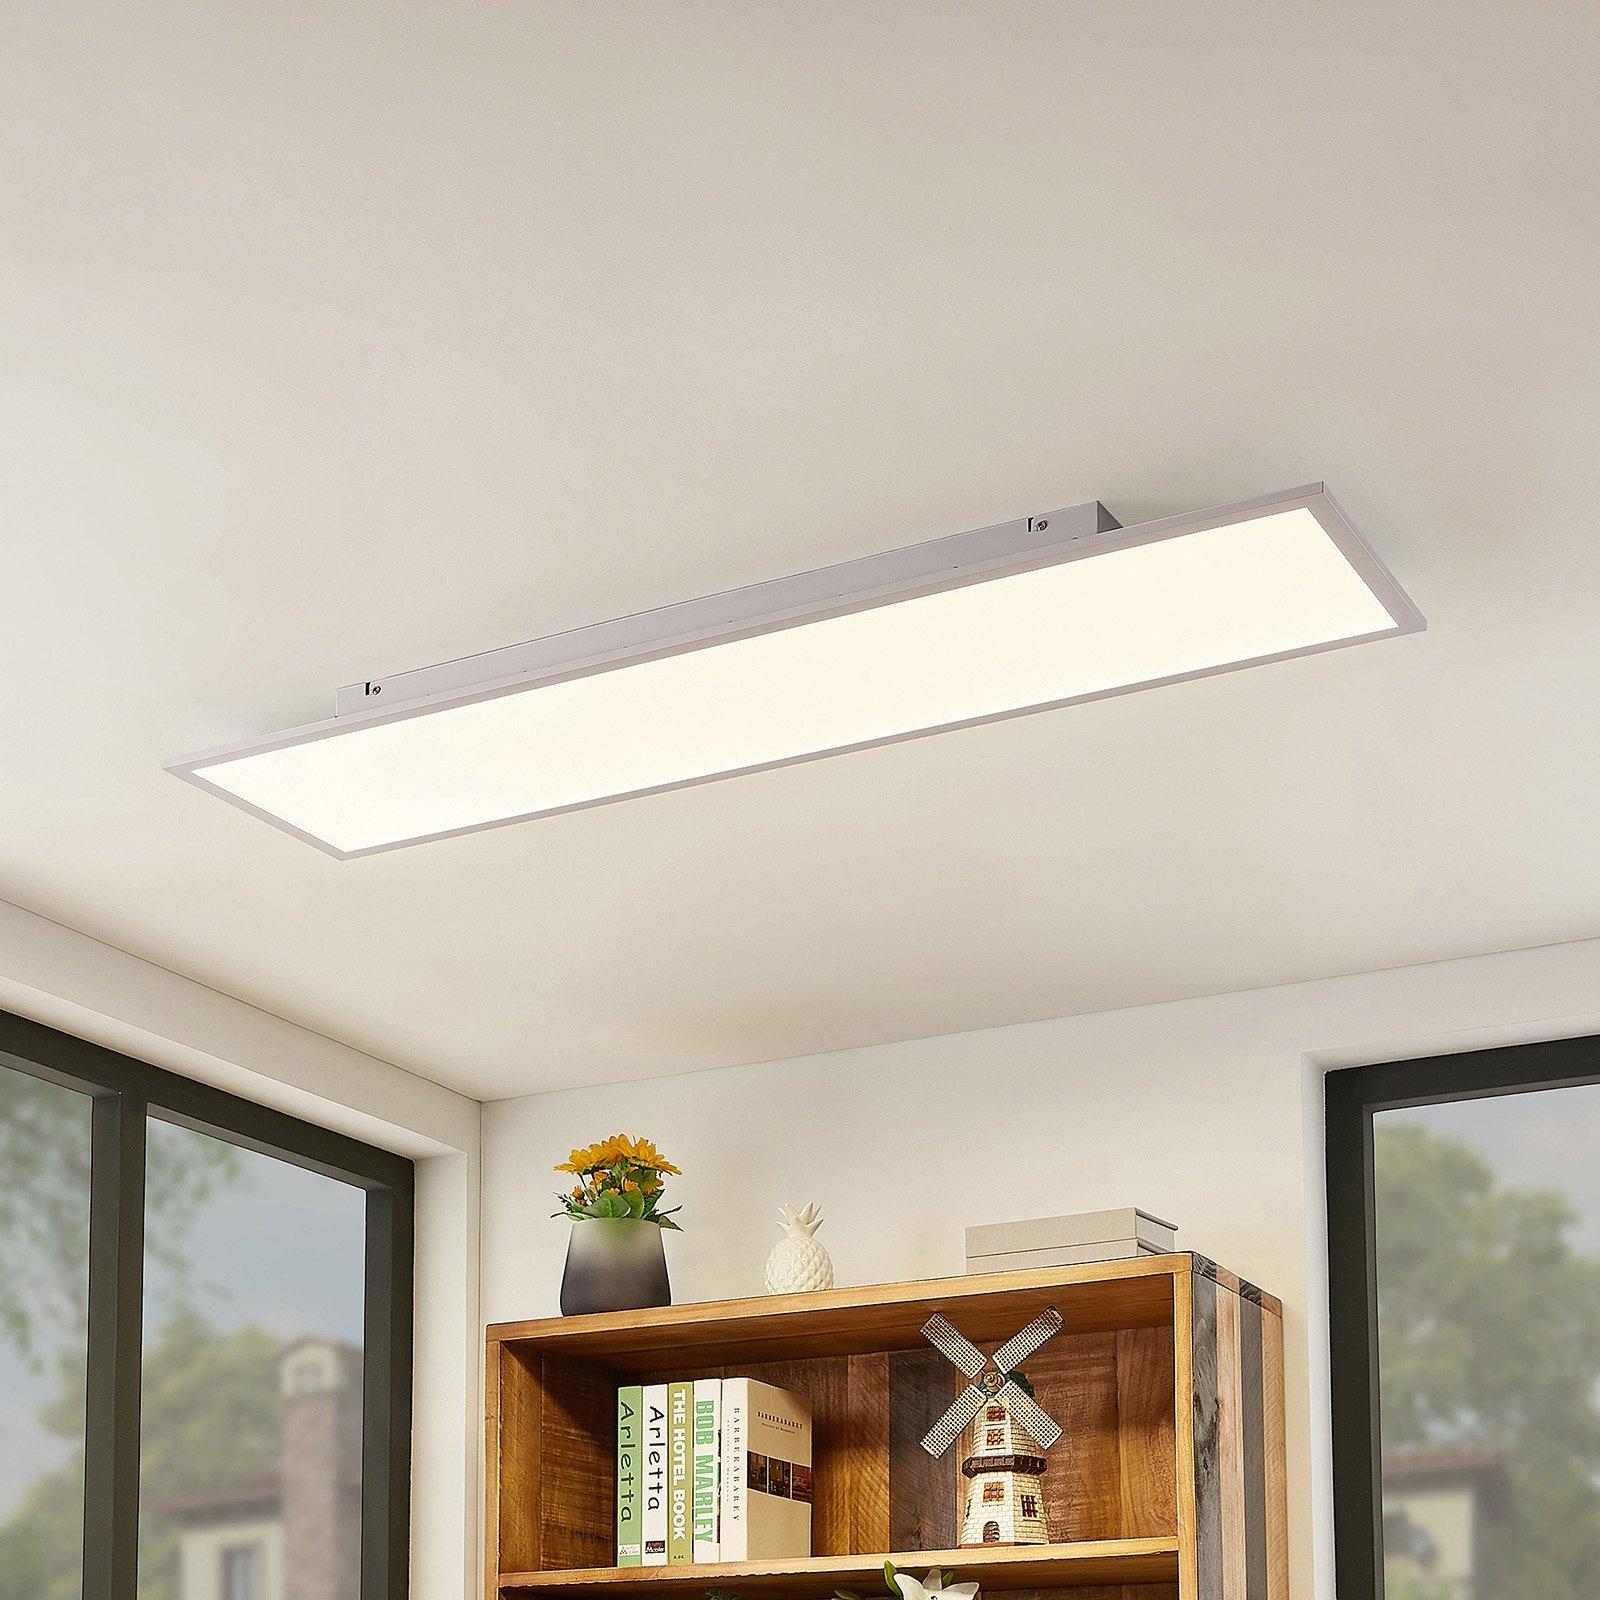 Lindby Luay LED-panel, 3 000-6 000 K, 30 x 120 cm